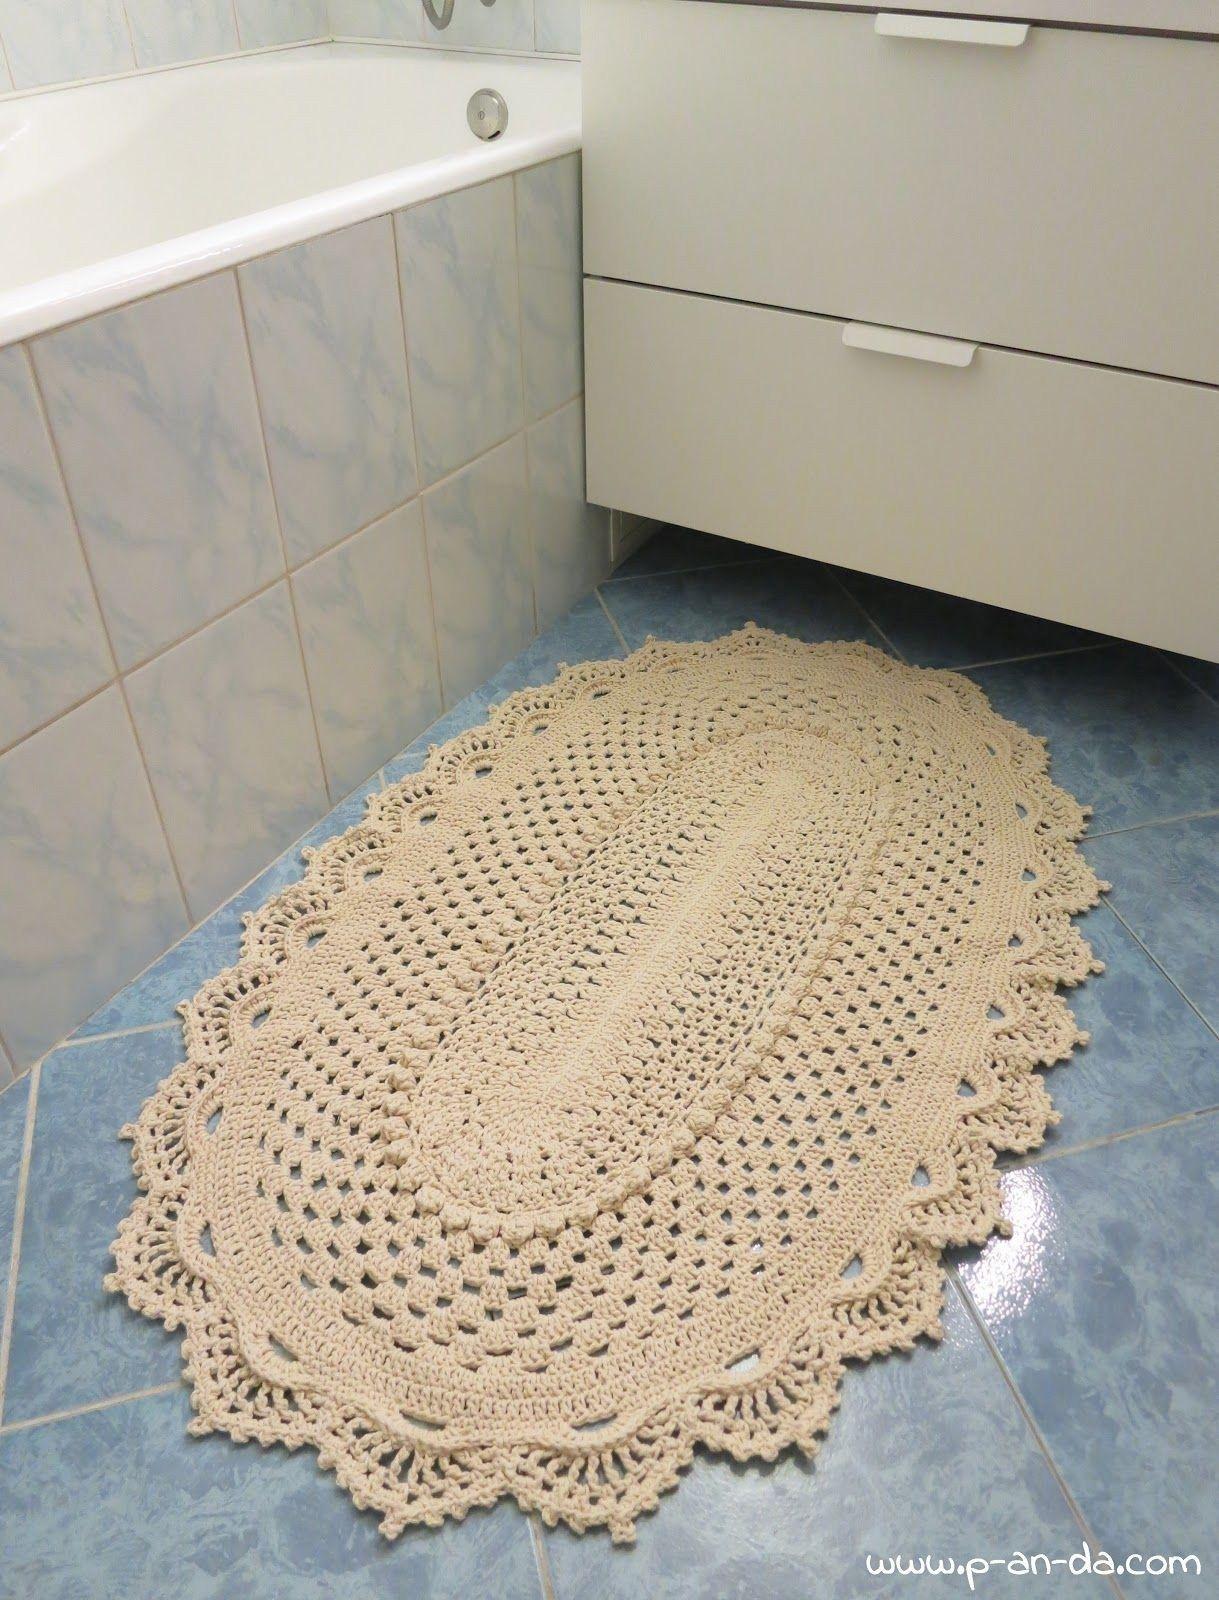 Crochet Animal Rugs: Over 20 crochet patterns for fun floor mats ... | 1600x1219